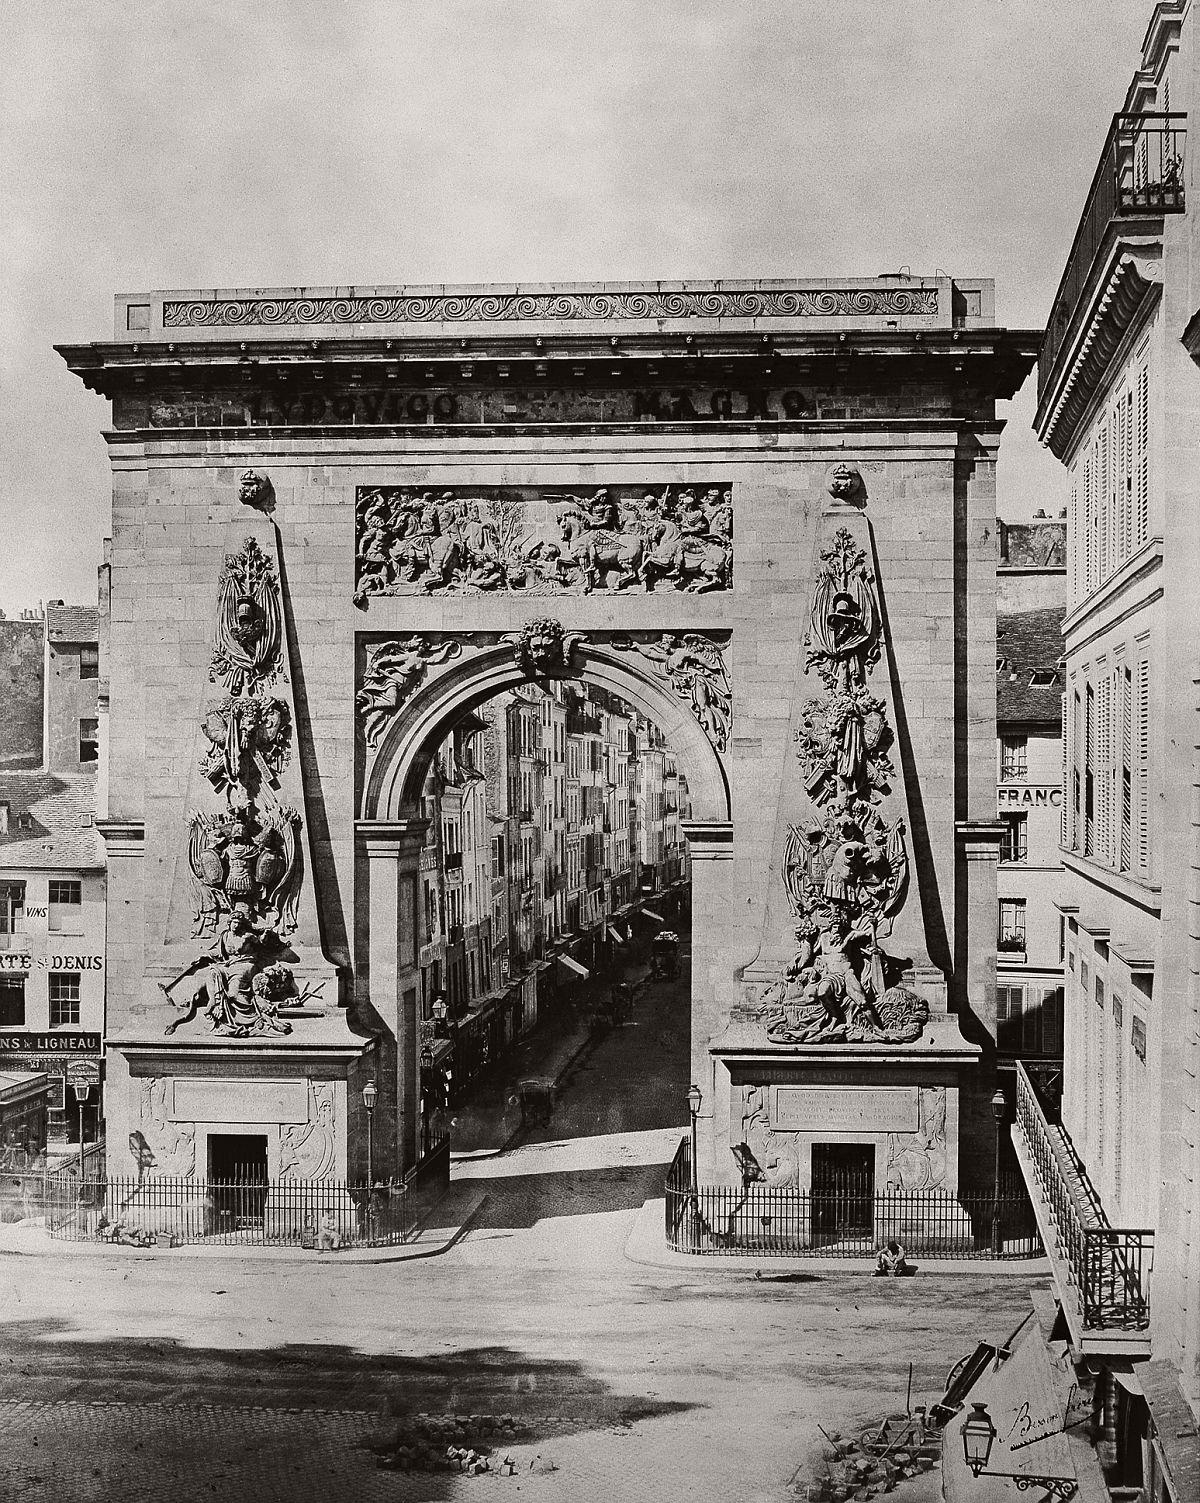 Porte St. Denis, 1860s.